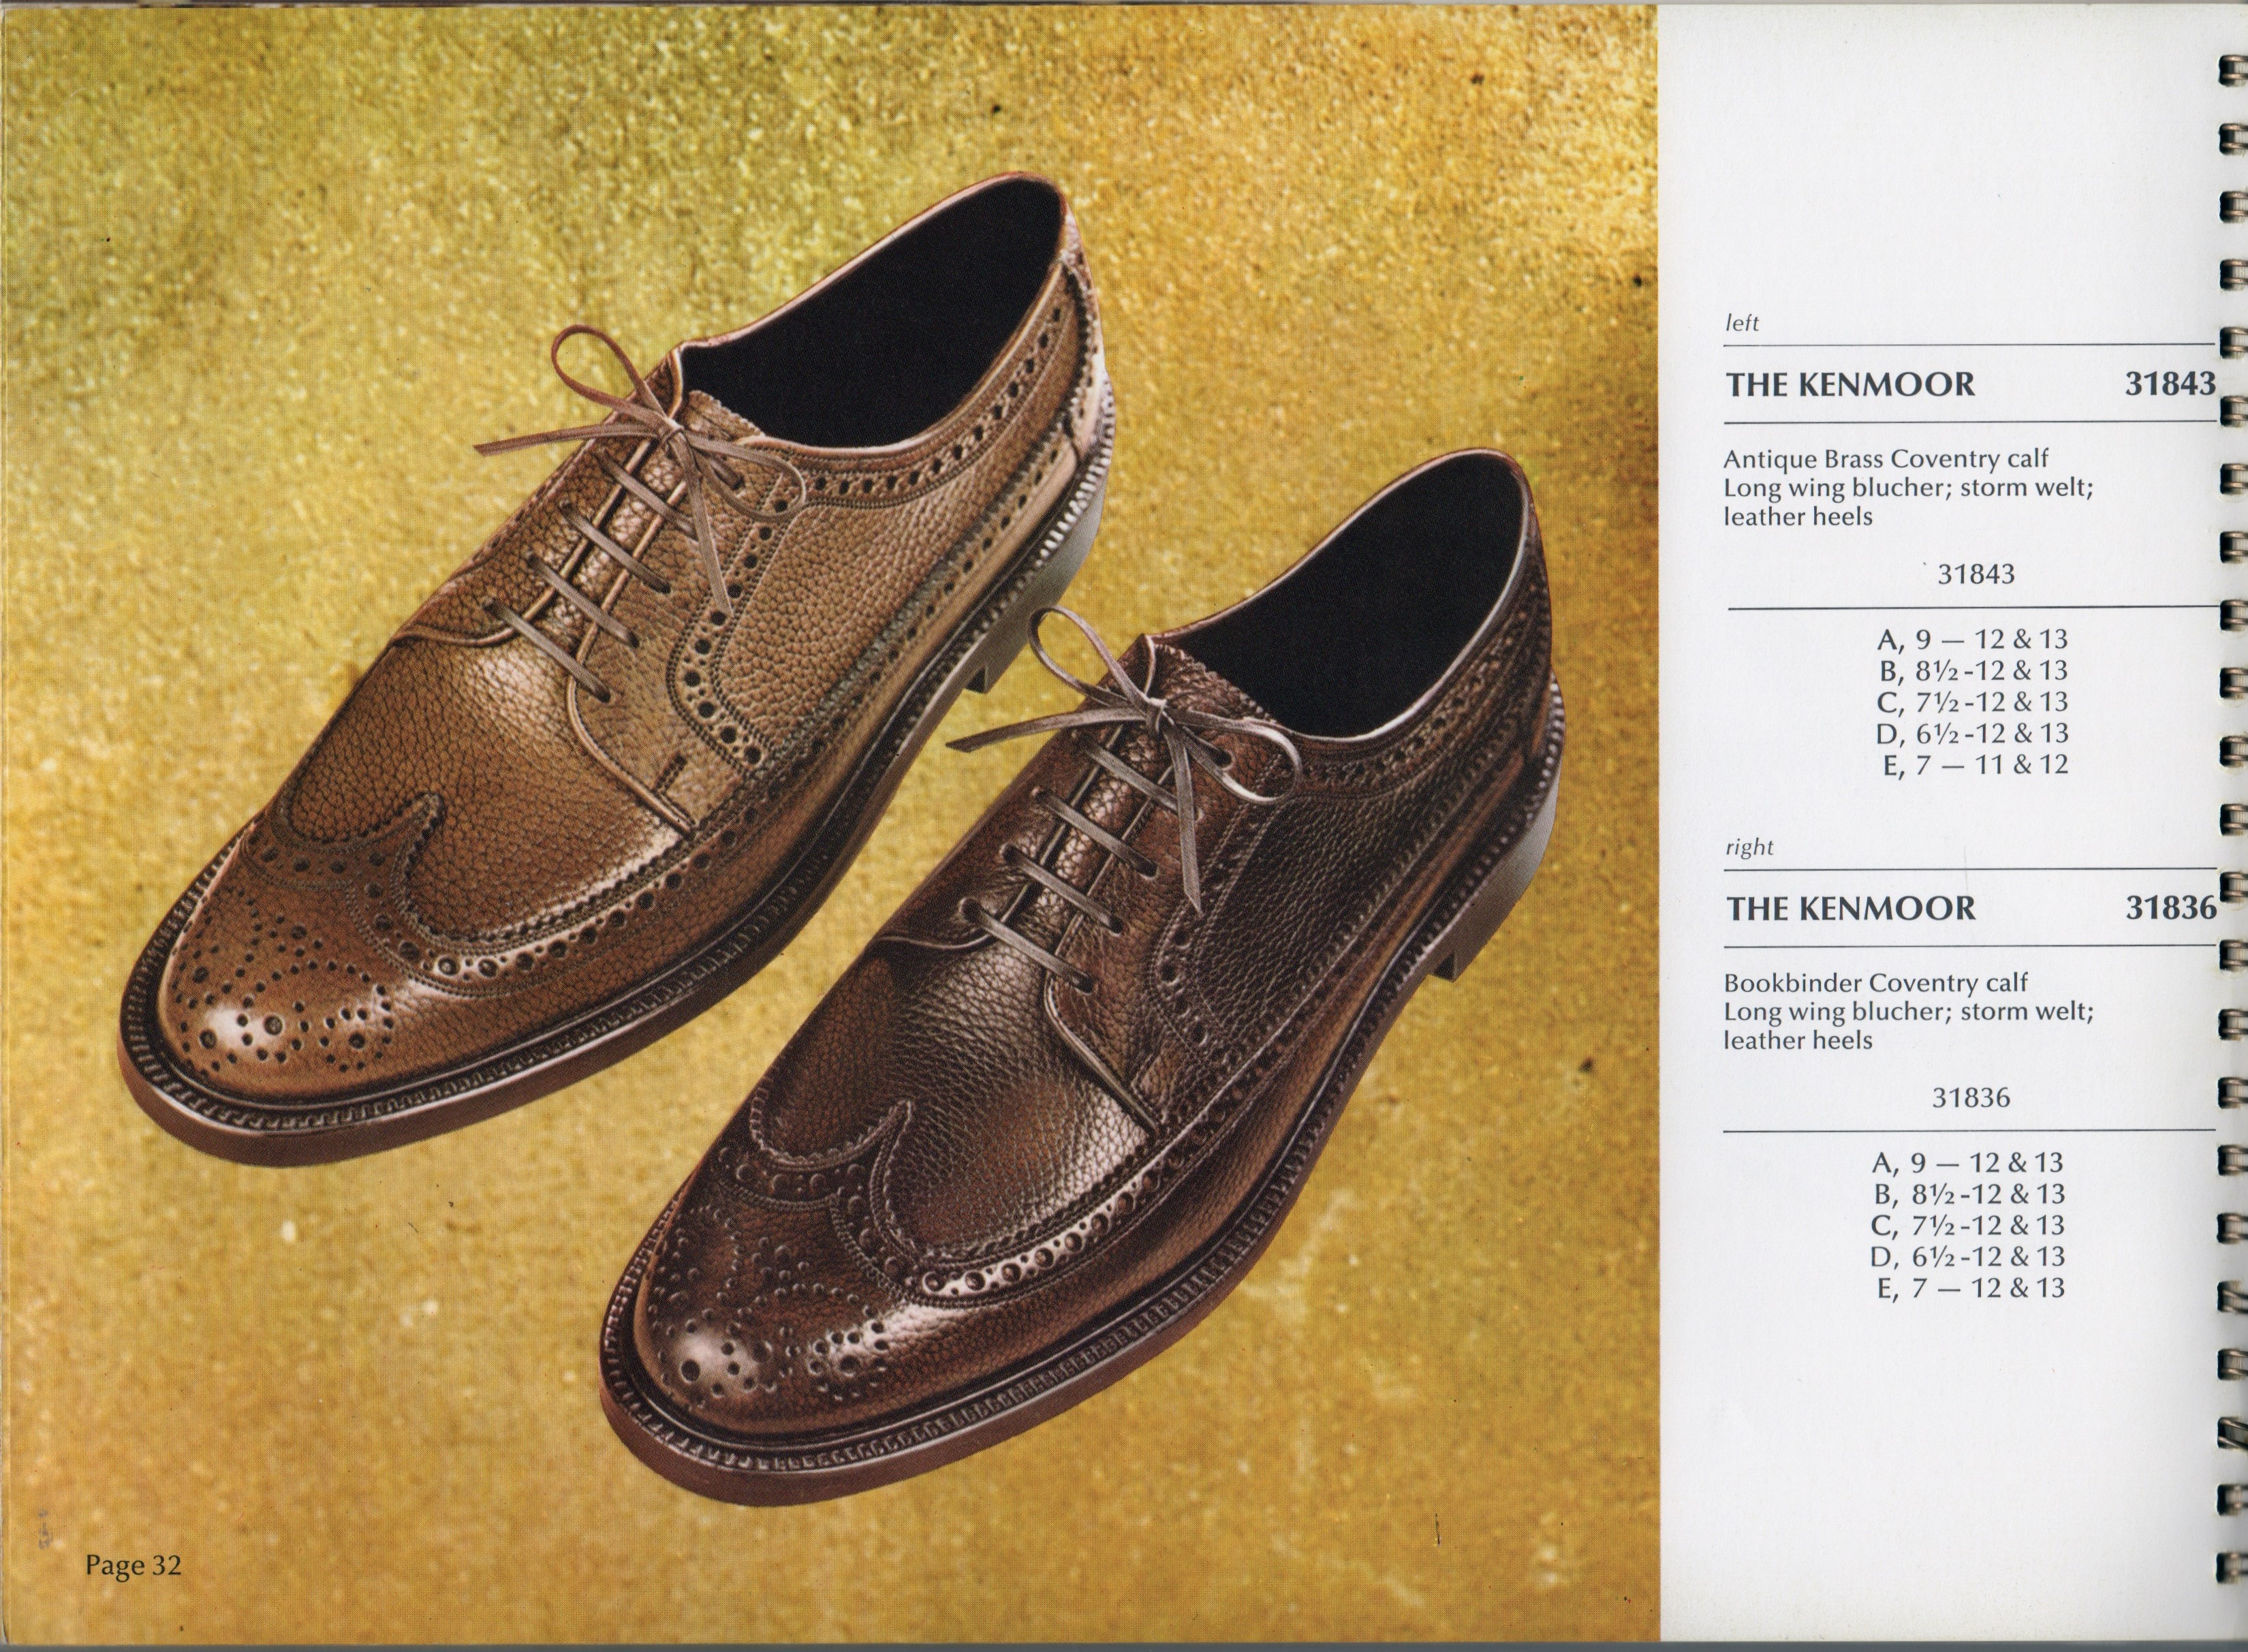 Florsheim 31836 1969 catalog